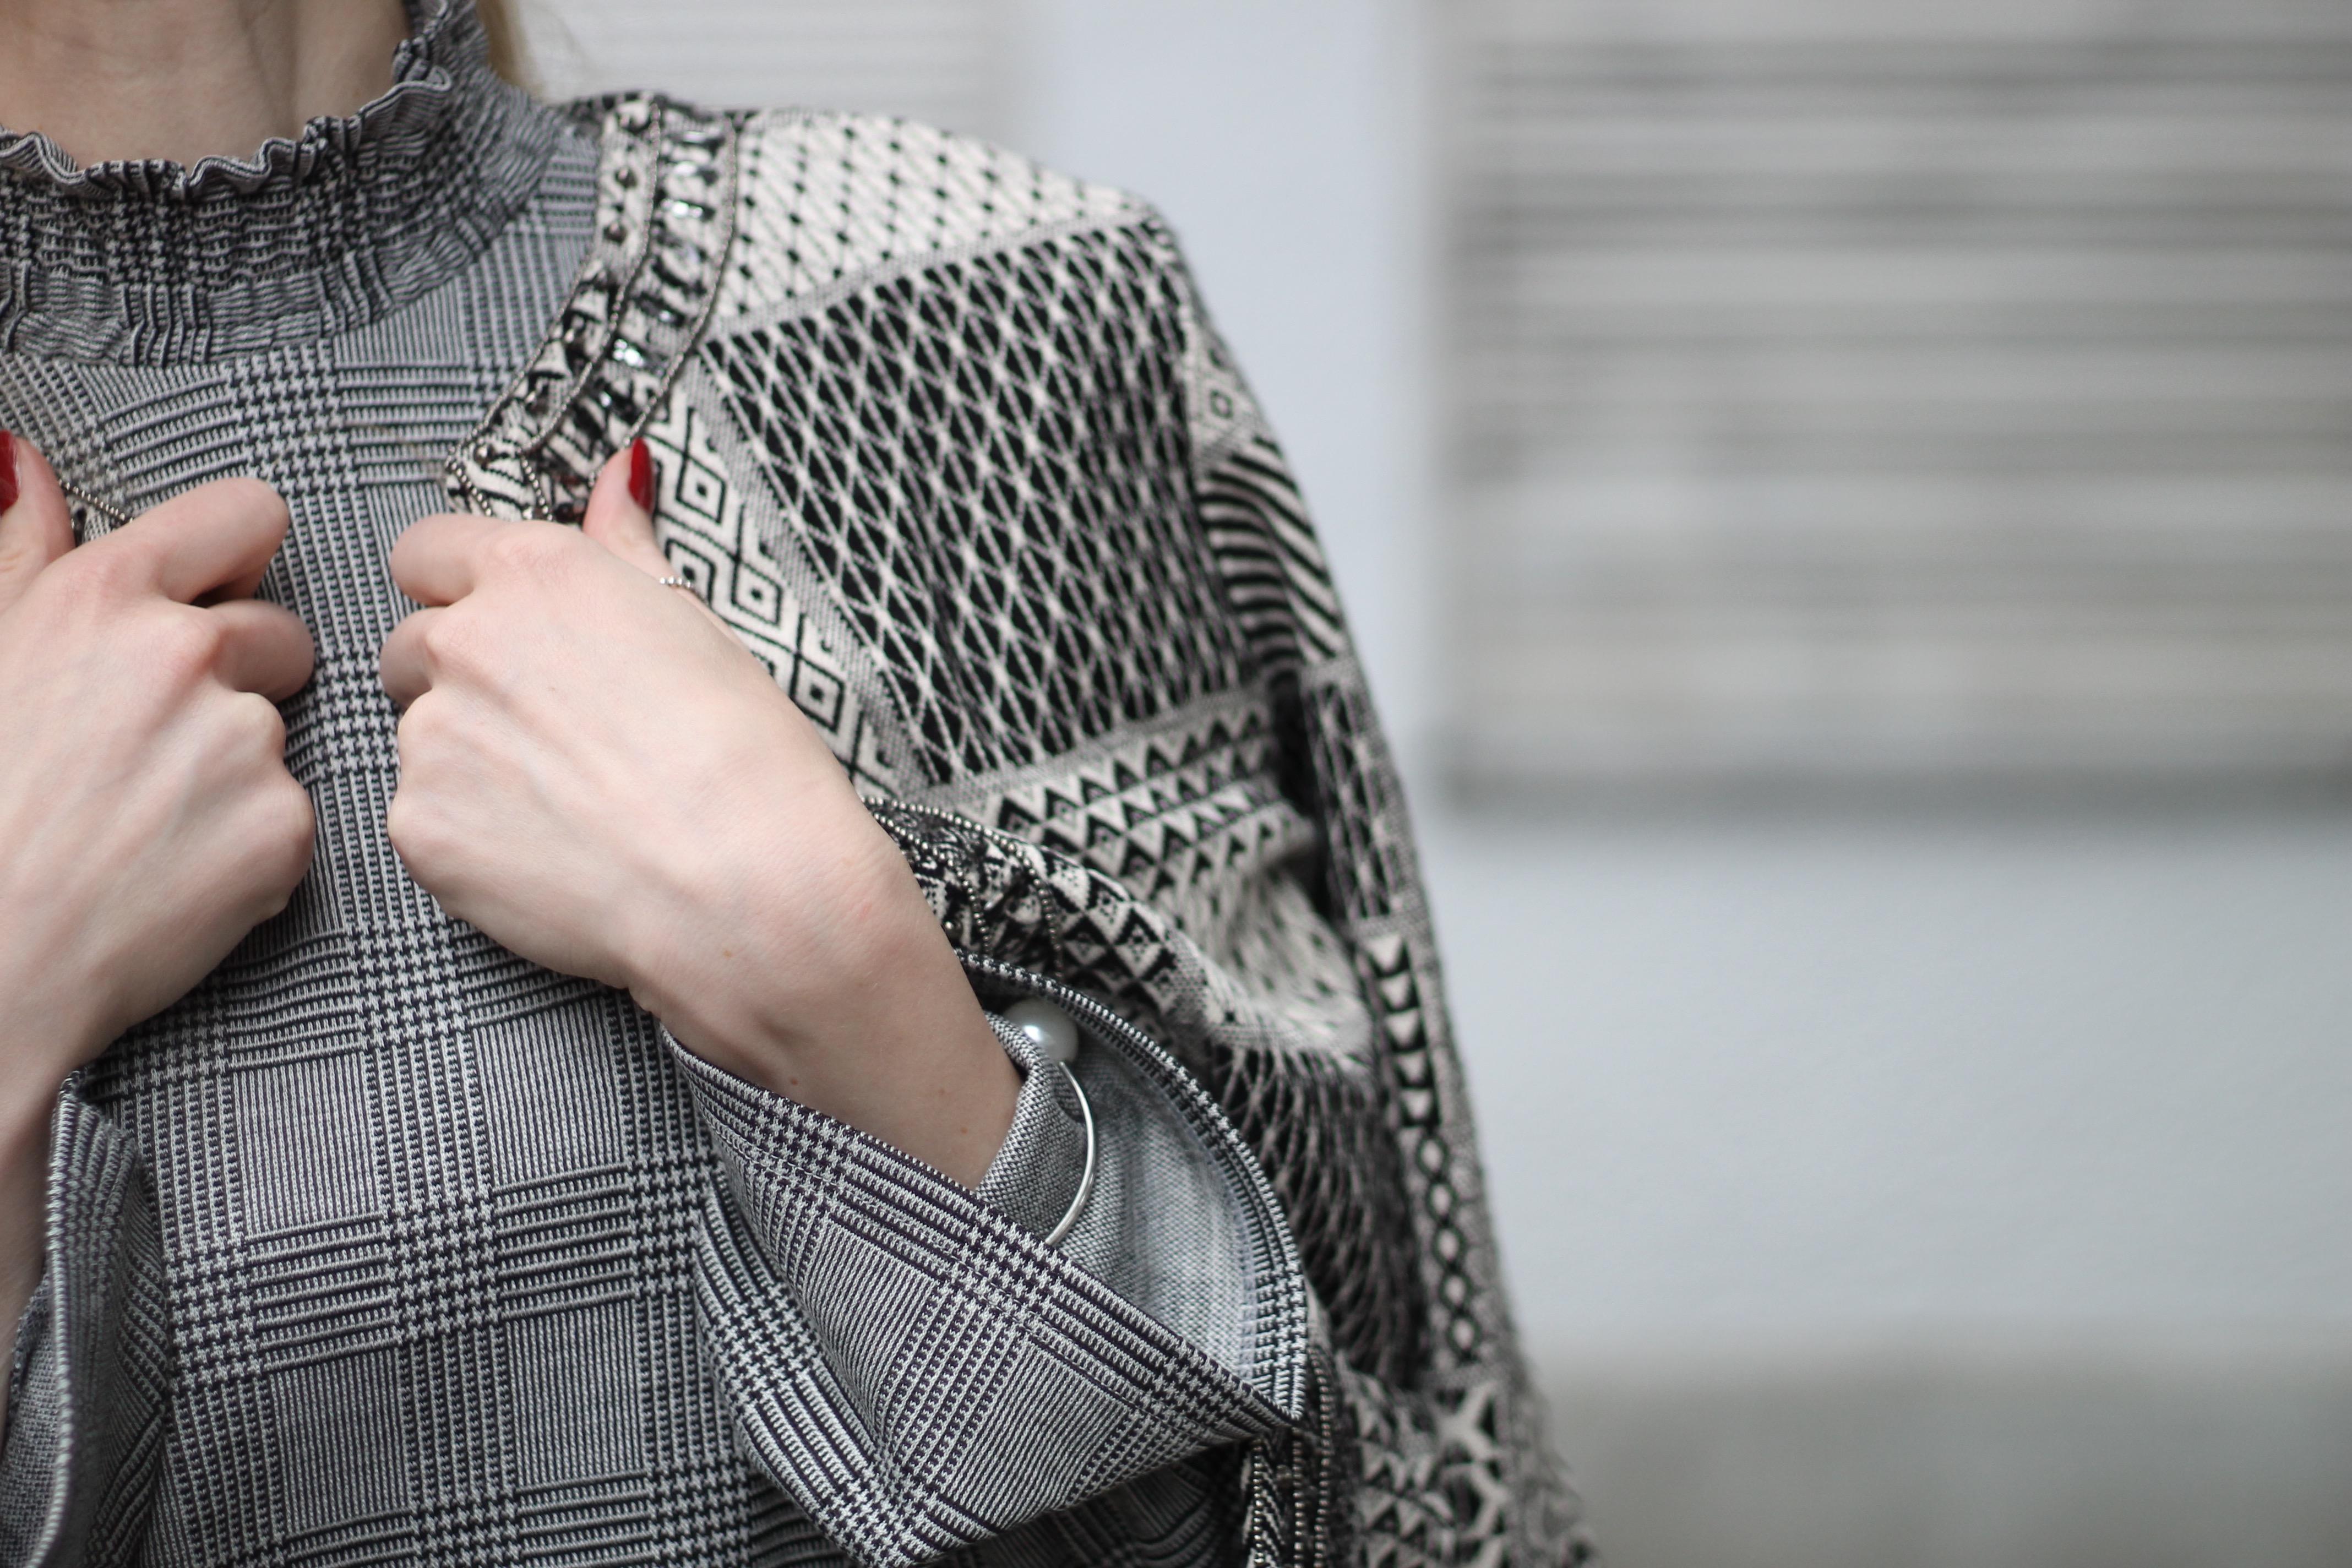 MON MODE   Fashion Blogger   Berlin Street Style   Bell Sleeves   Monochrome Vibes   Glockenaermel